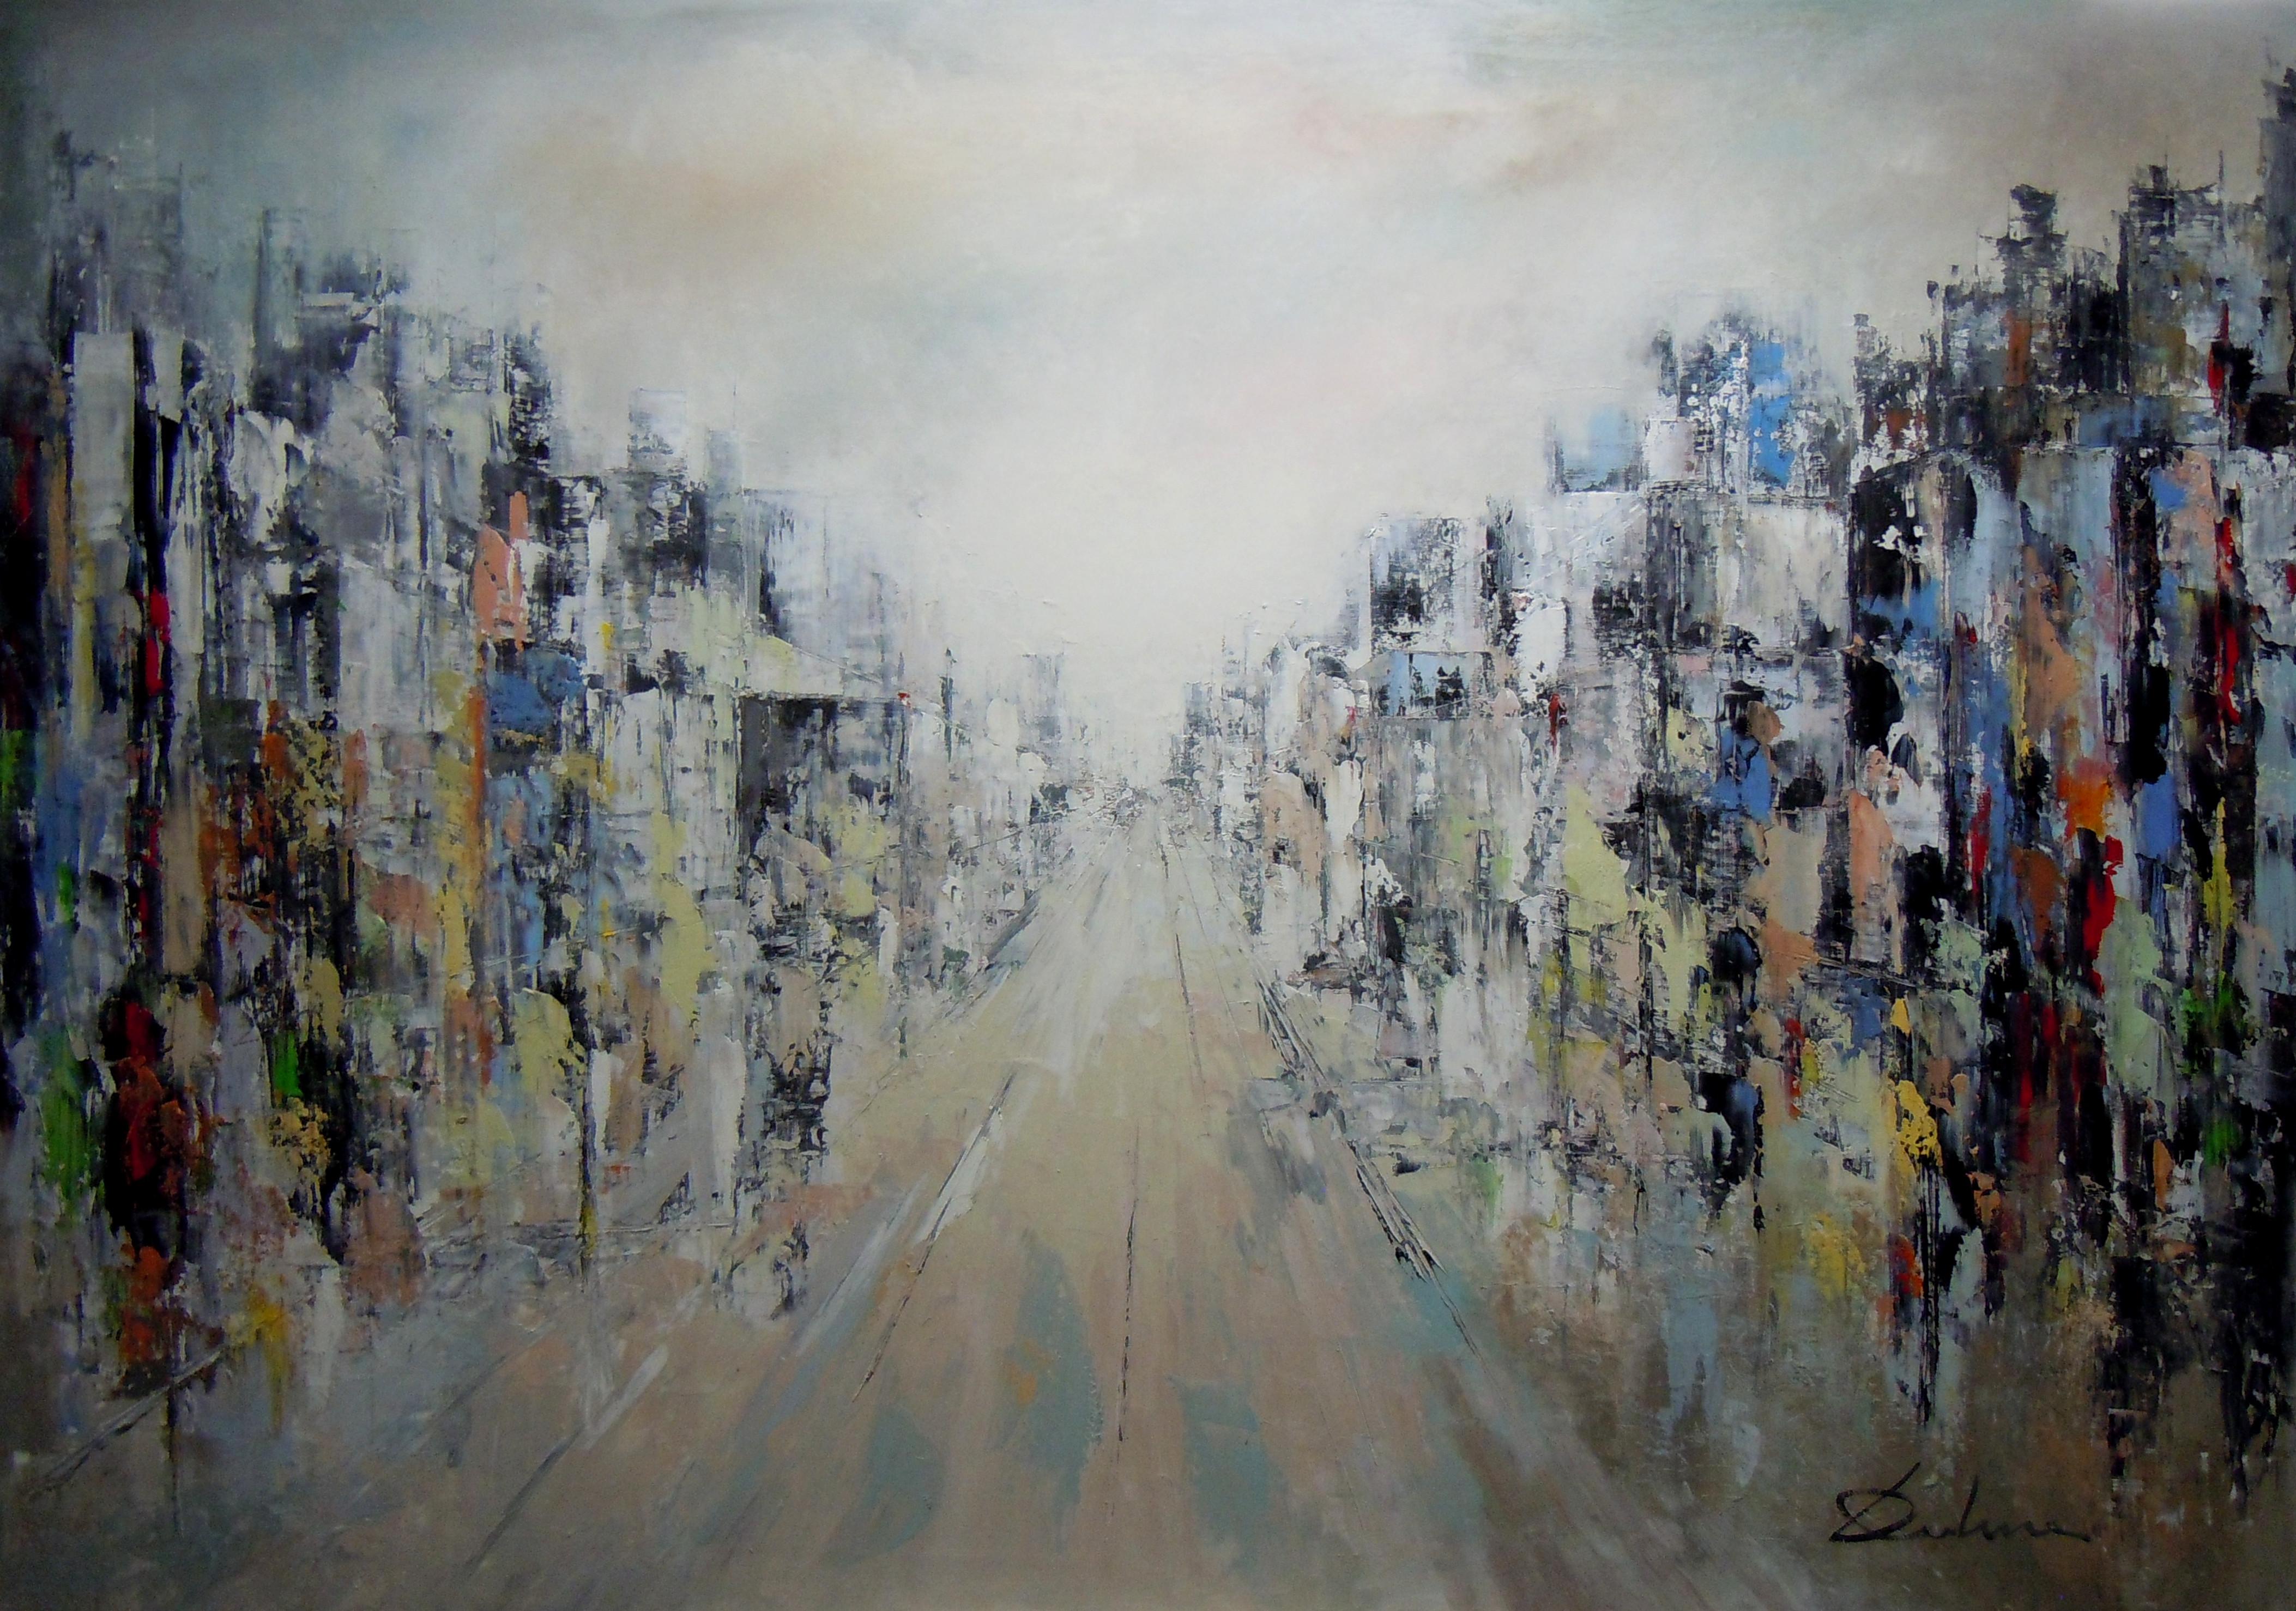 Boulevard de l'infini